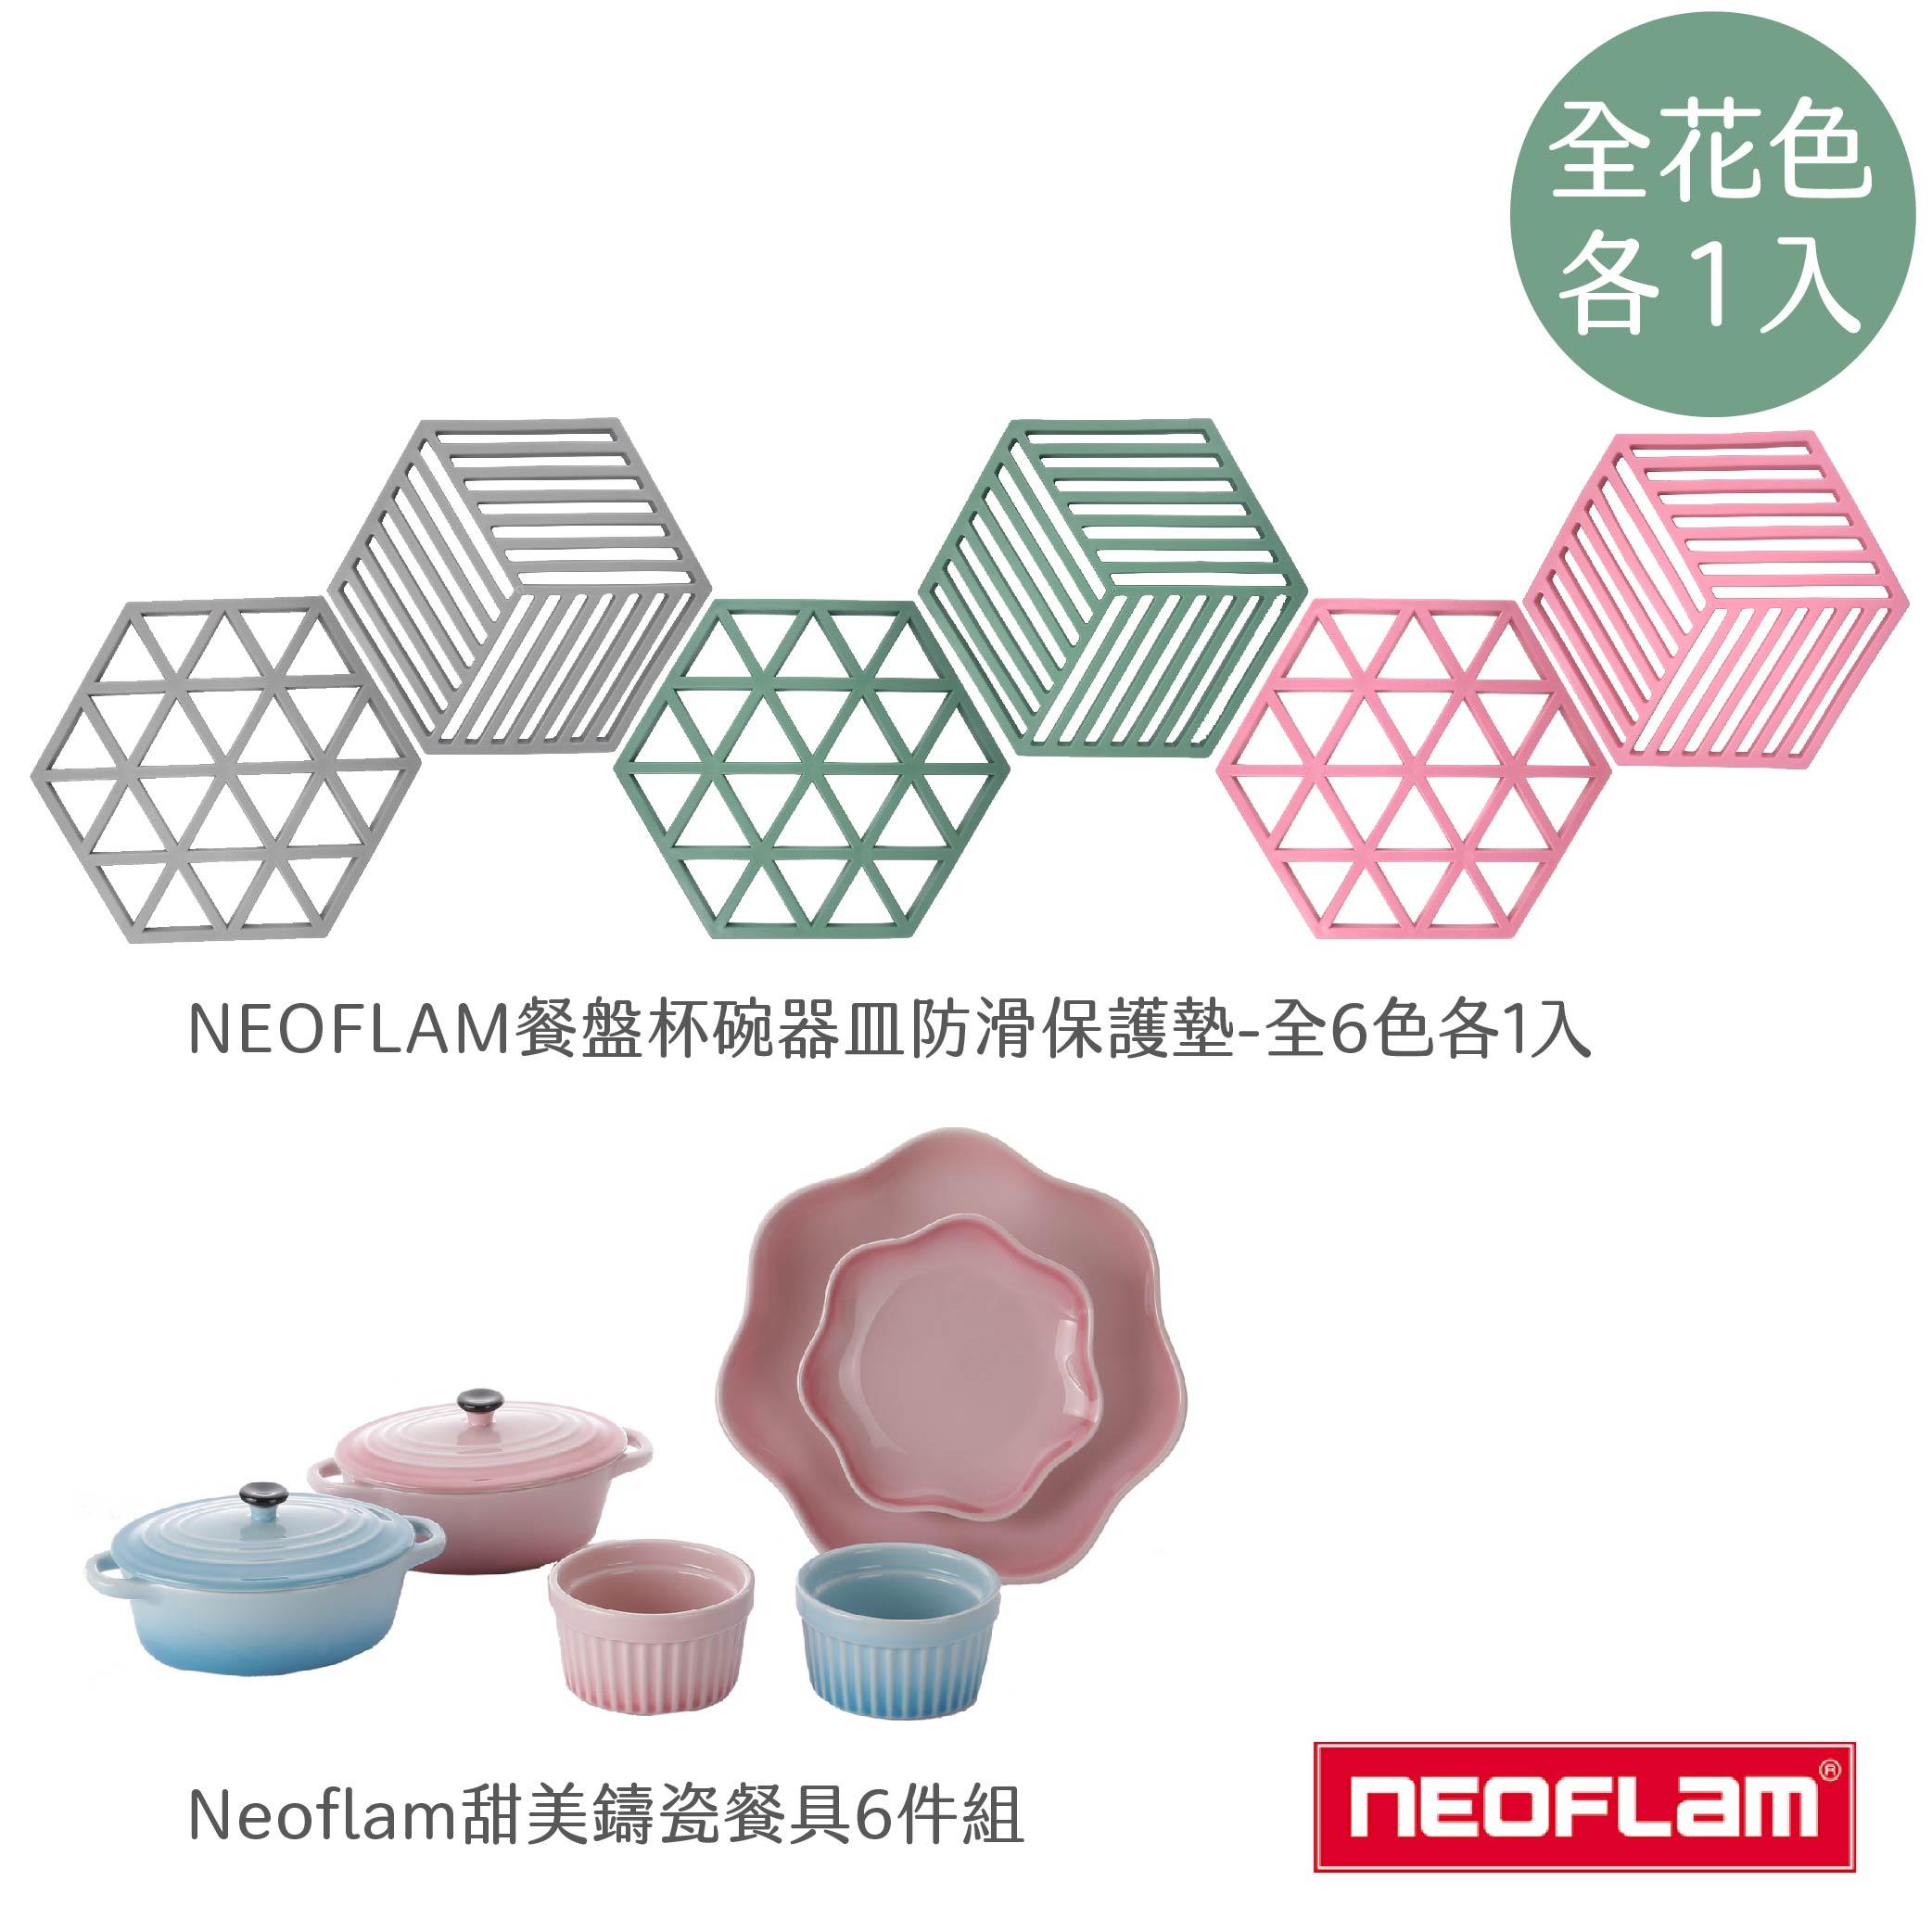 【NEOFLAM】甜美鑄瓷餐具6件組 全花色各1入